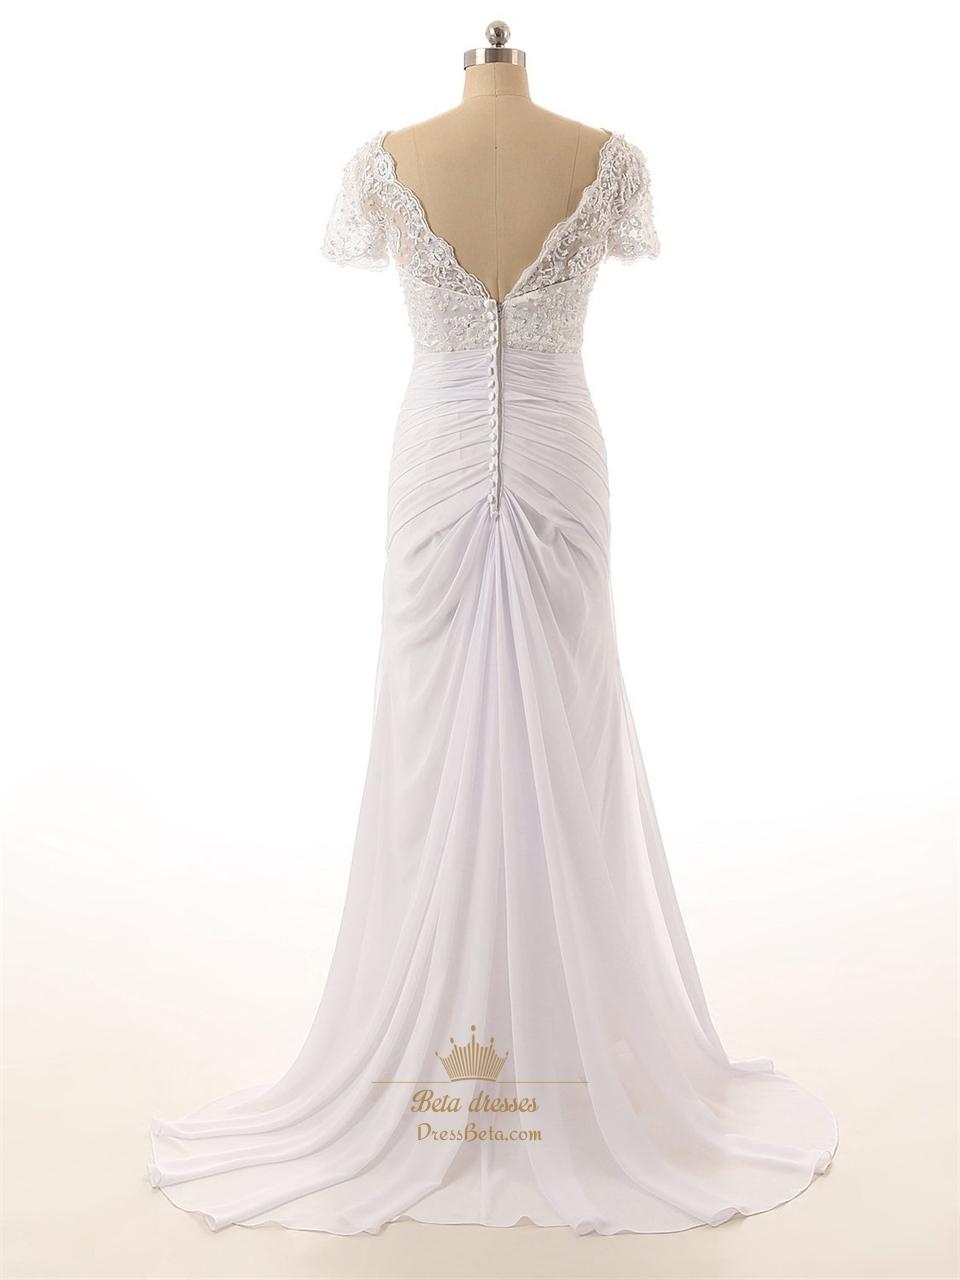 Lace Bodice VNeckline Short Sleeves Wedding Dress With